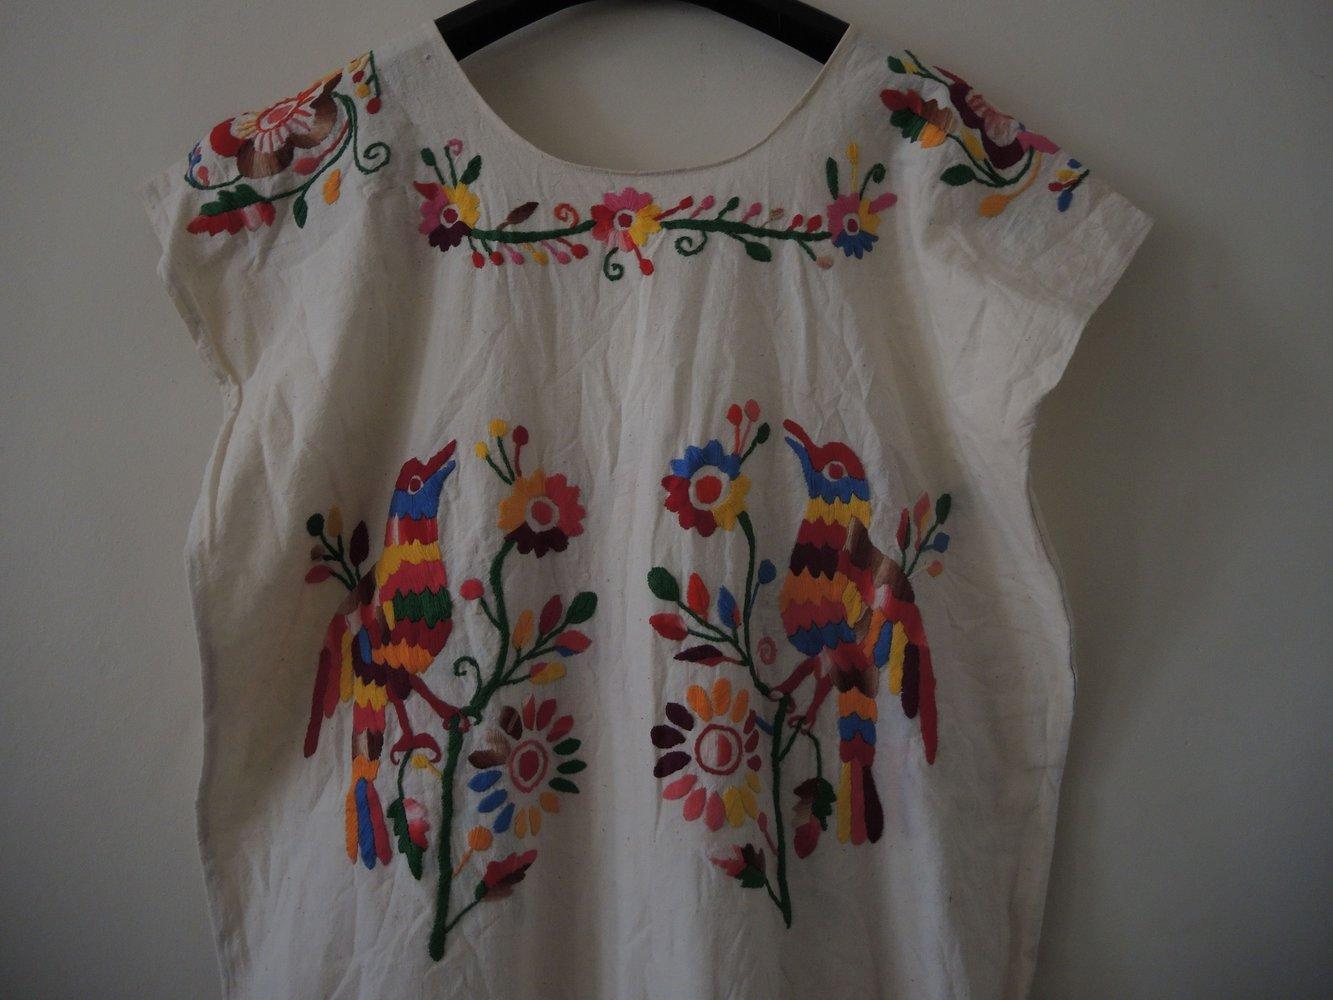 promo code 59fa9 ec29b Opulent besticktes mexikanisches Oaxacan Huipil Vintage Folklore Maxi Kleid  Unikat Boho Ethno Festival Coachella